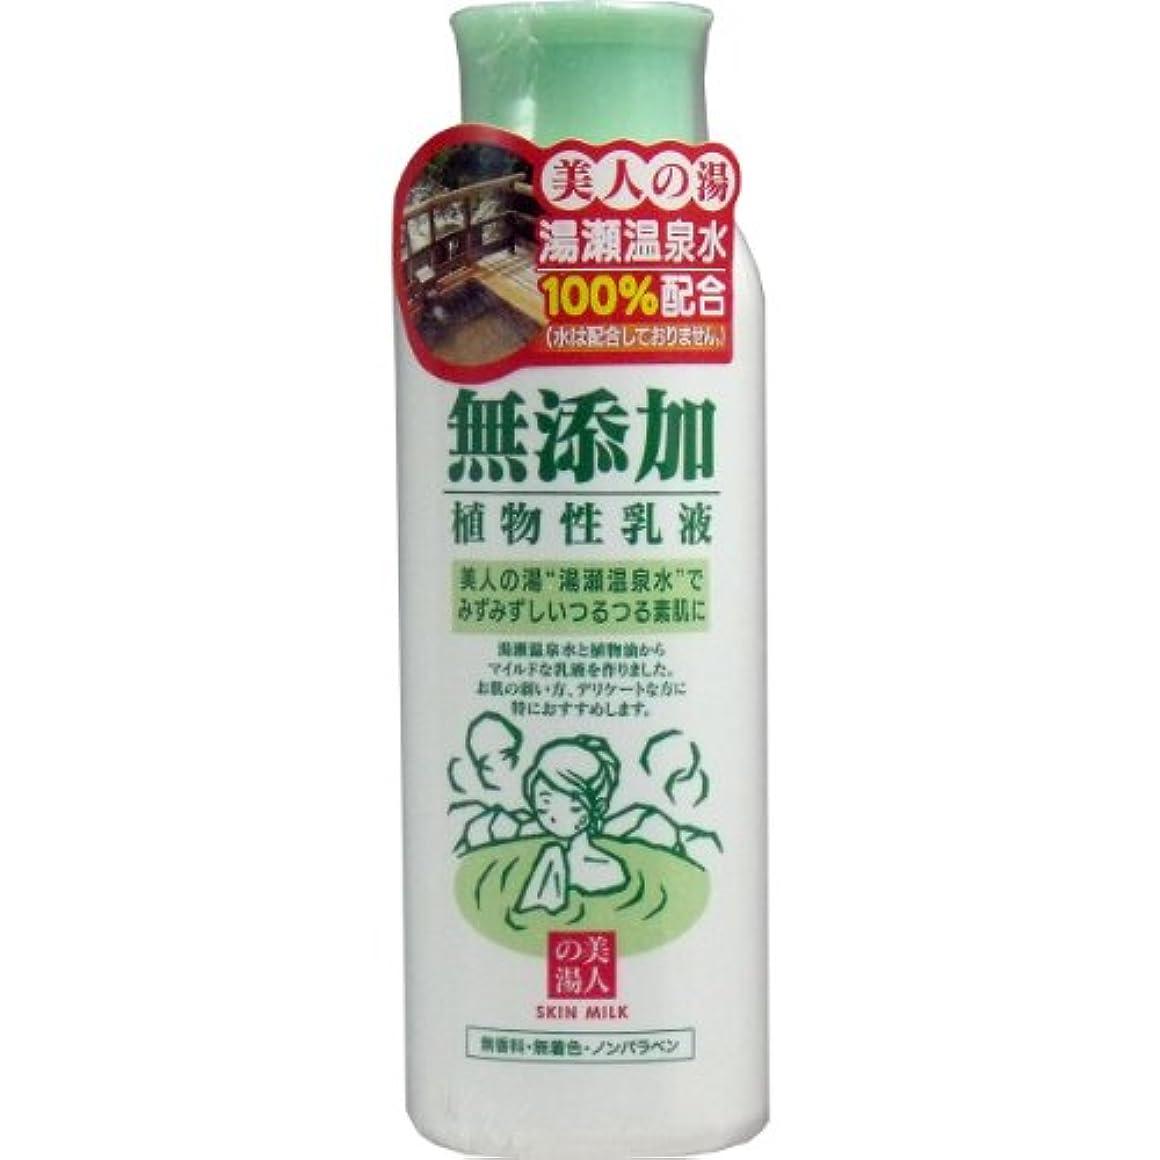 区別救援忠実ユゼ 無添加植物性乳液 150mL「4点セット」